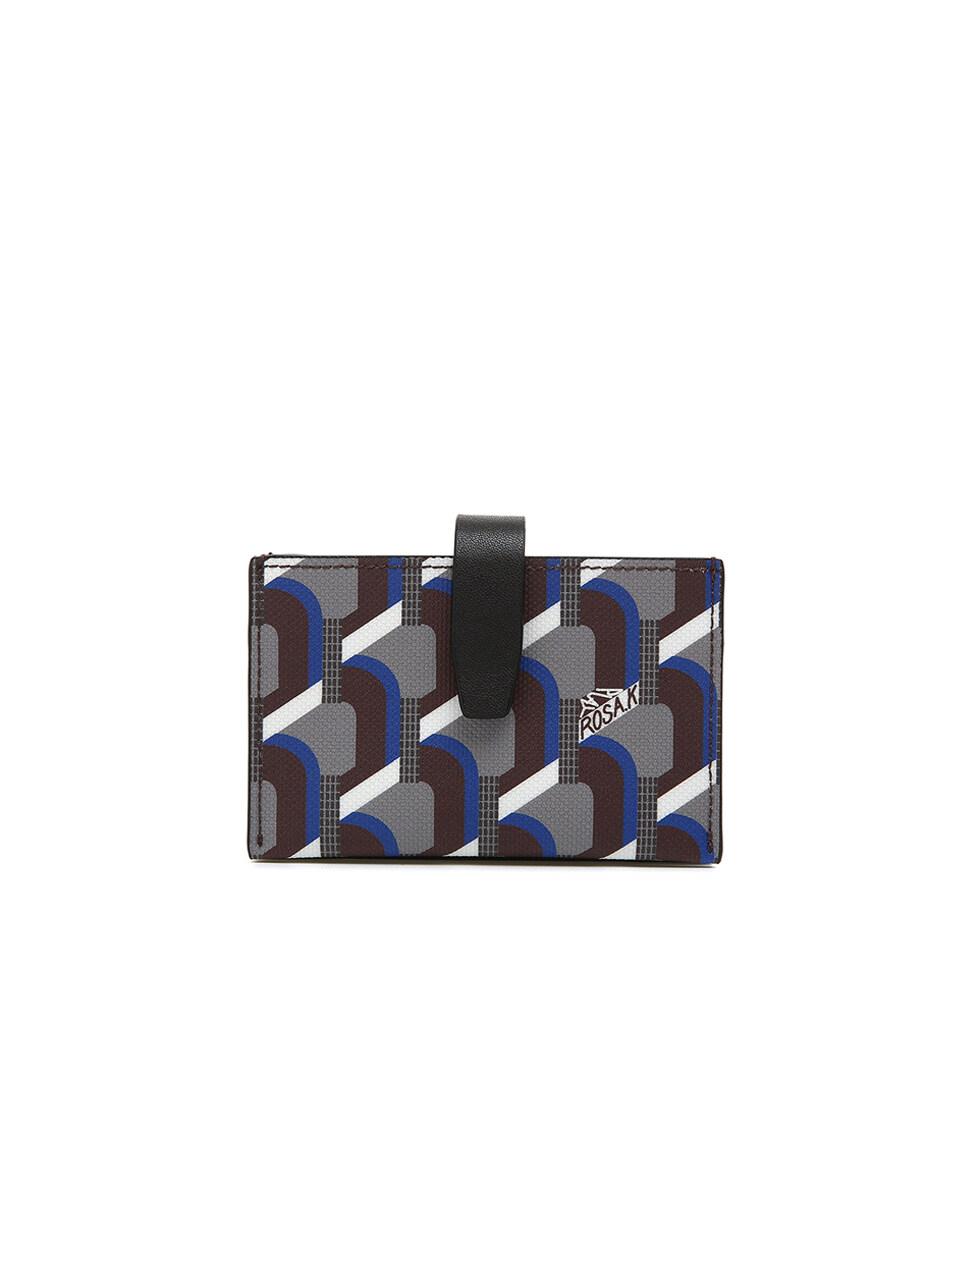 Monogram Accordion Wallet - Oak Blue